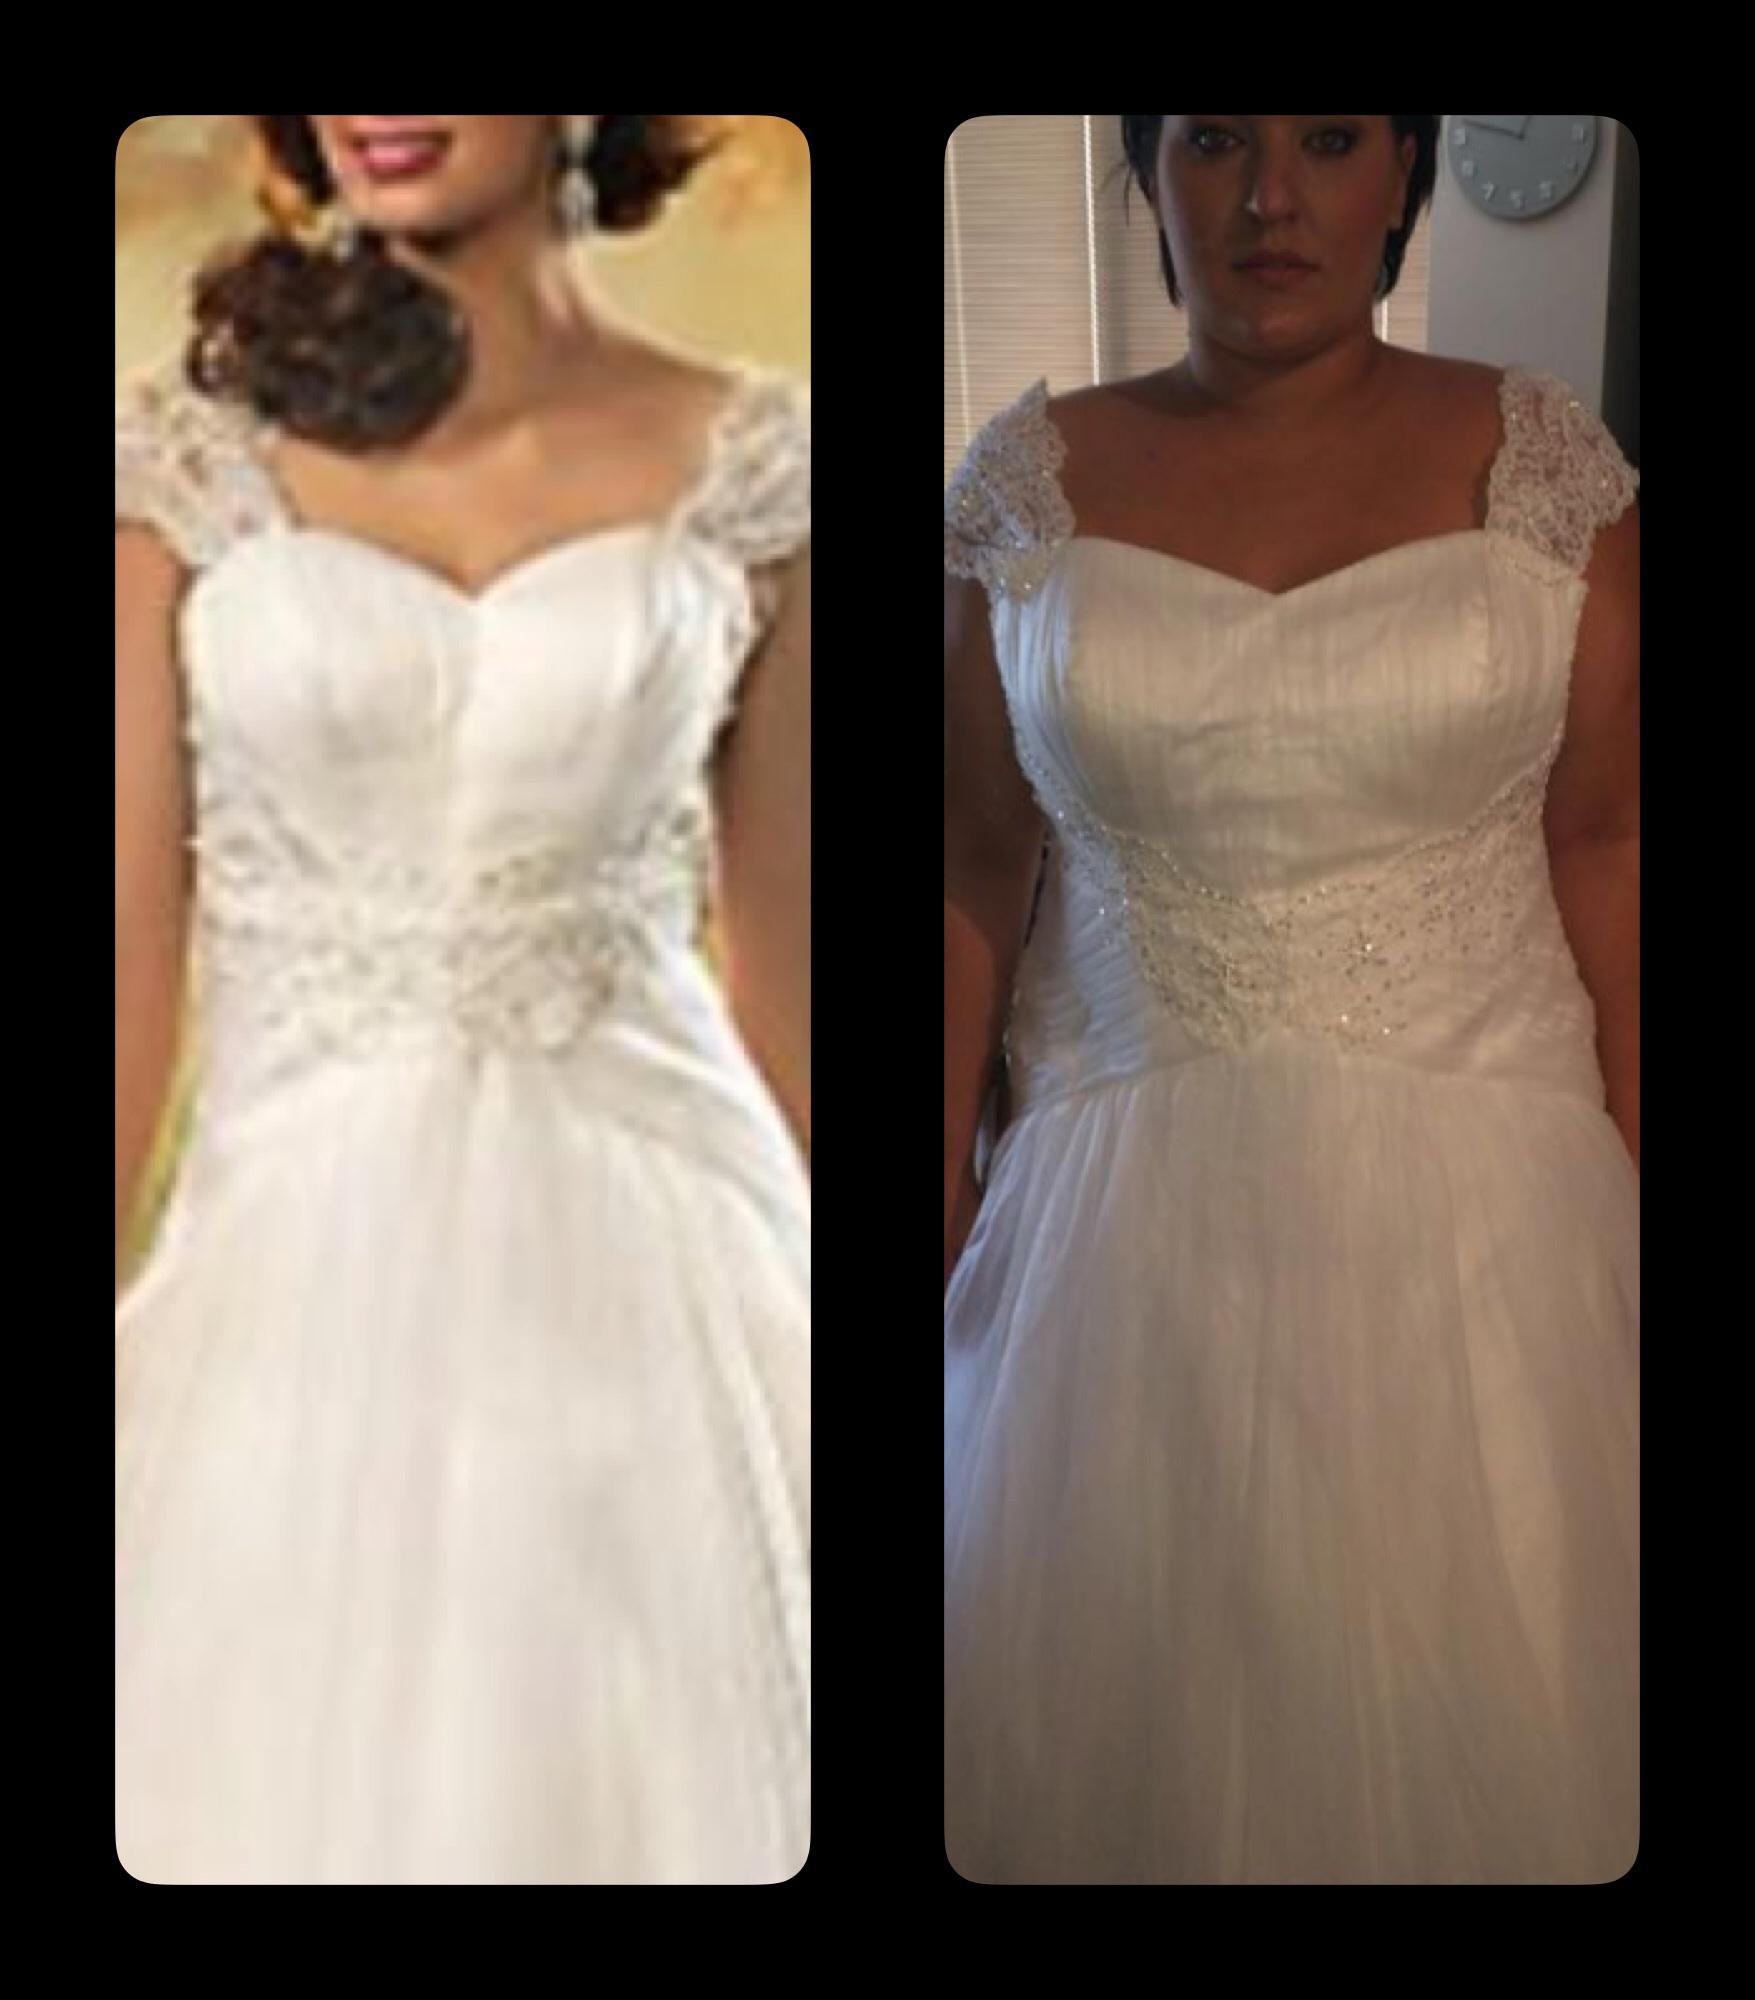 jj wedding dresses reviews photo - 1